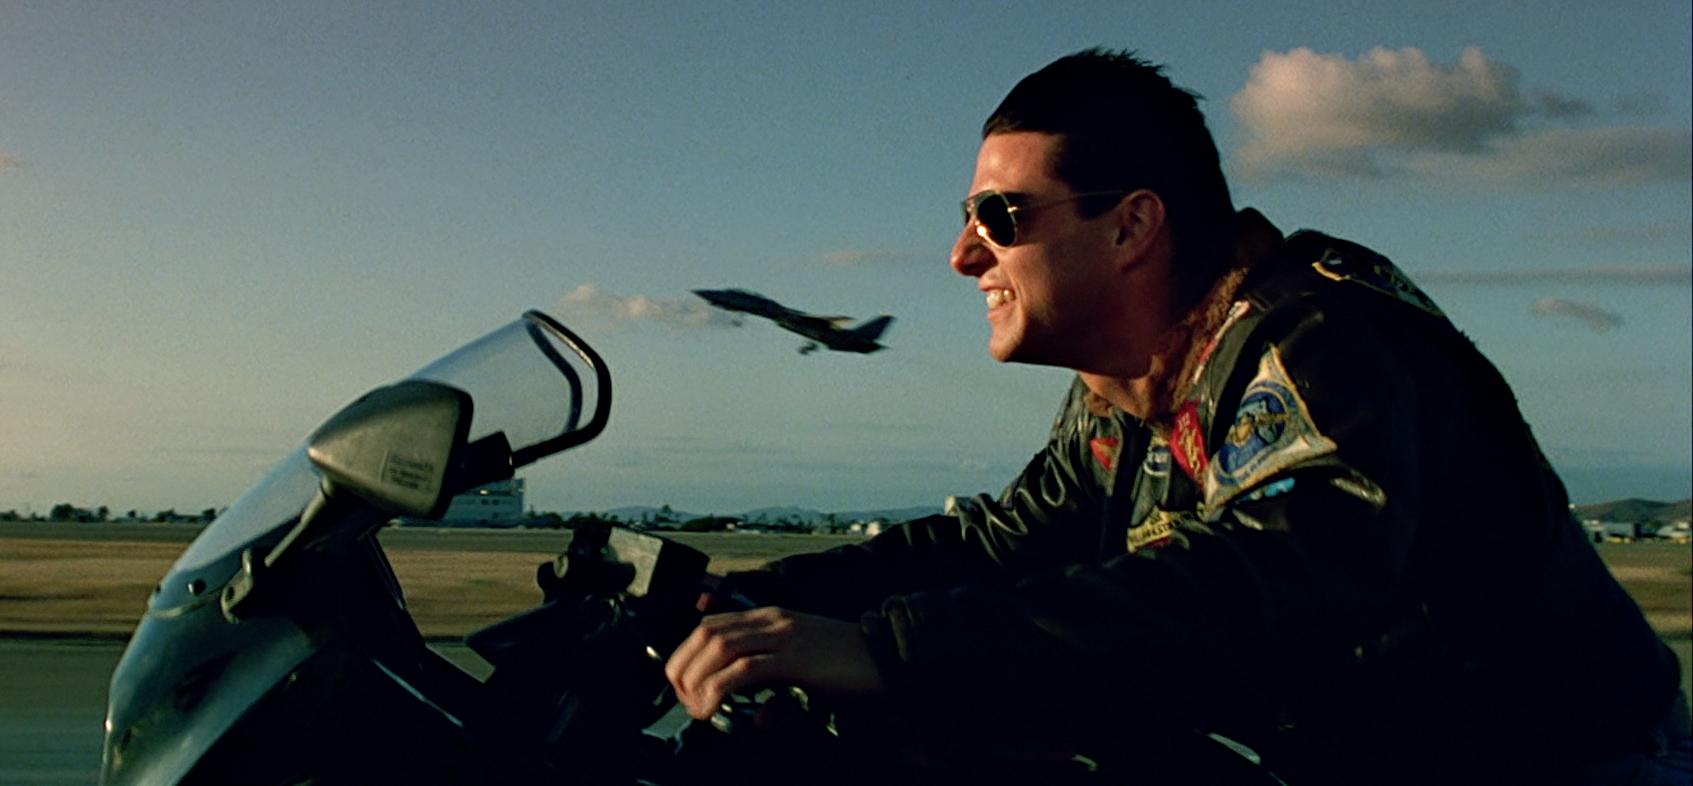 Joseph Kosinski May Direct Tom Cruise In Top Gun 2